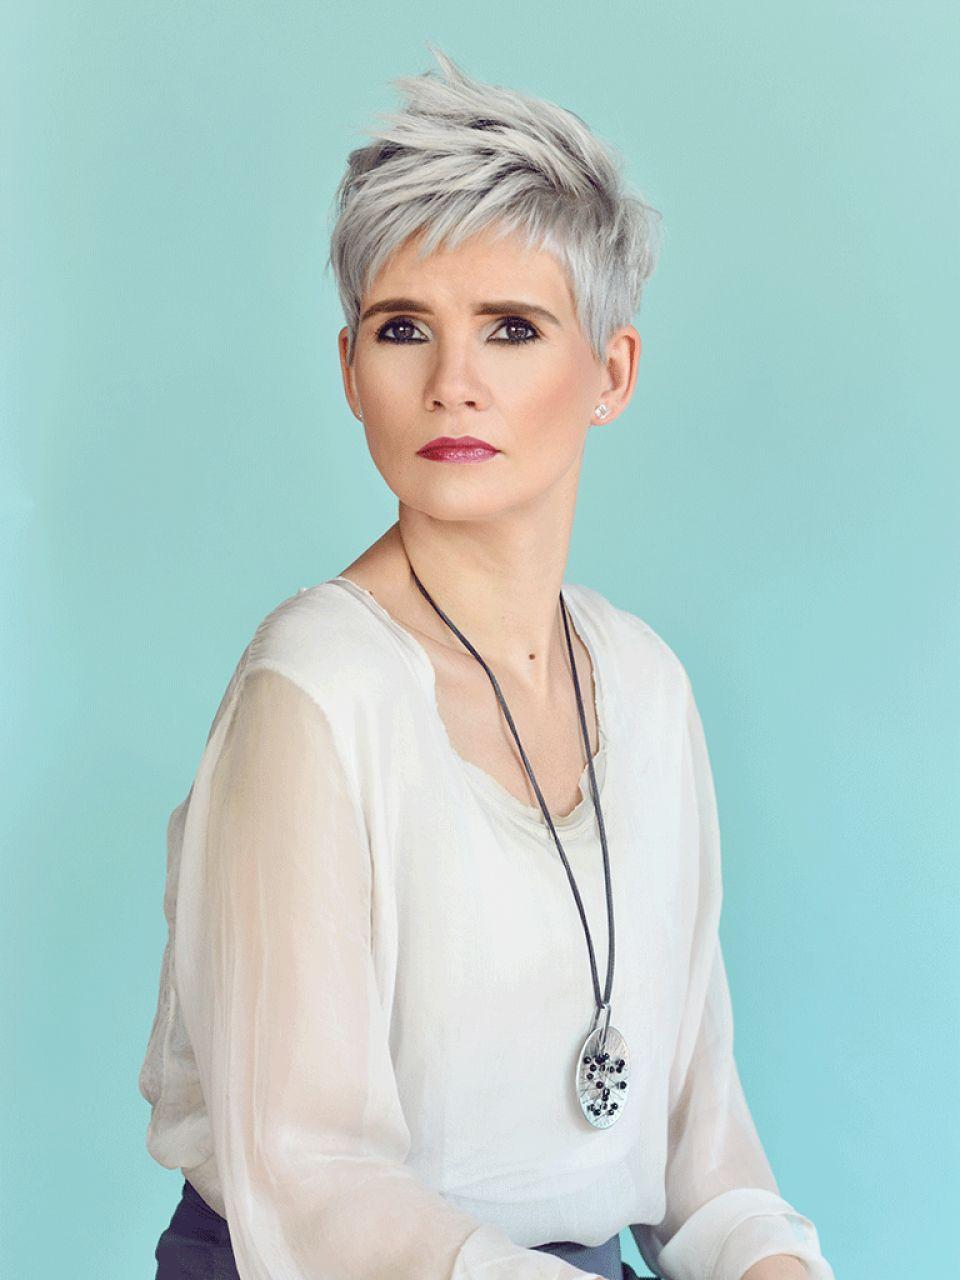 Frisuren Grau  Graue Damenfrisuren